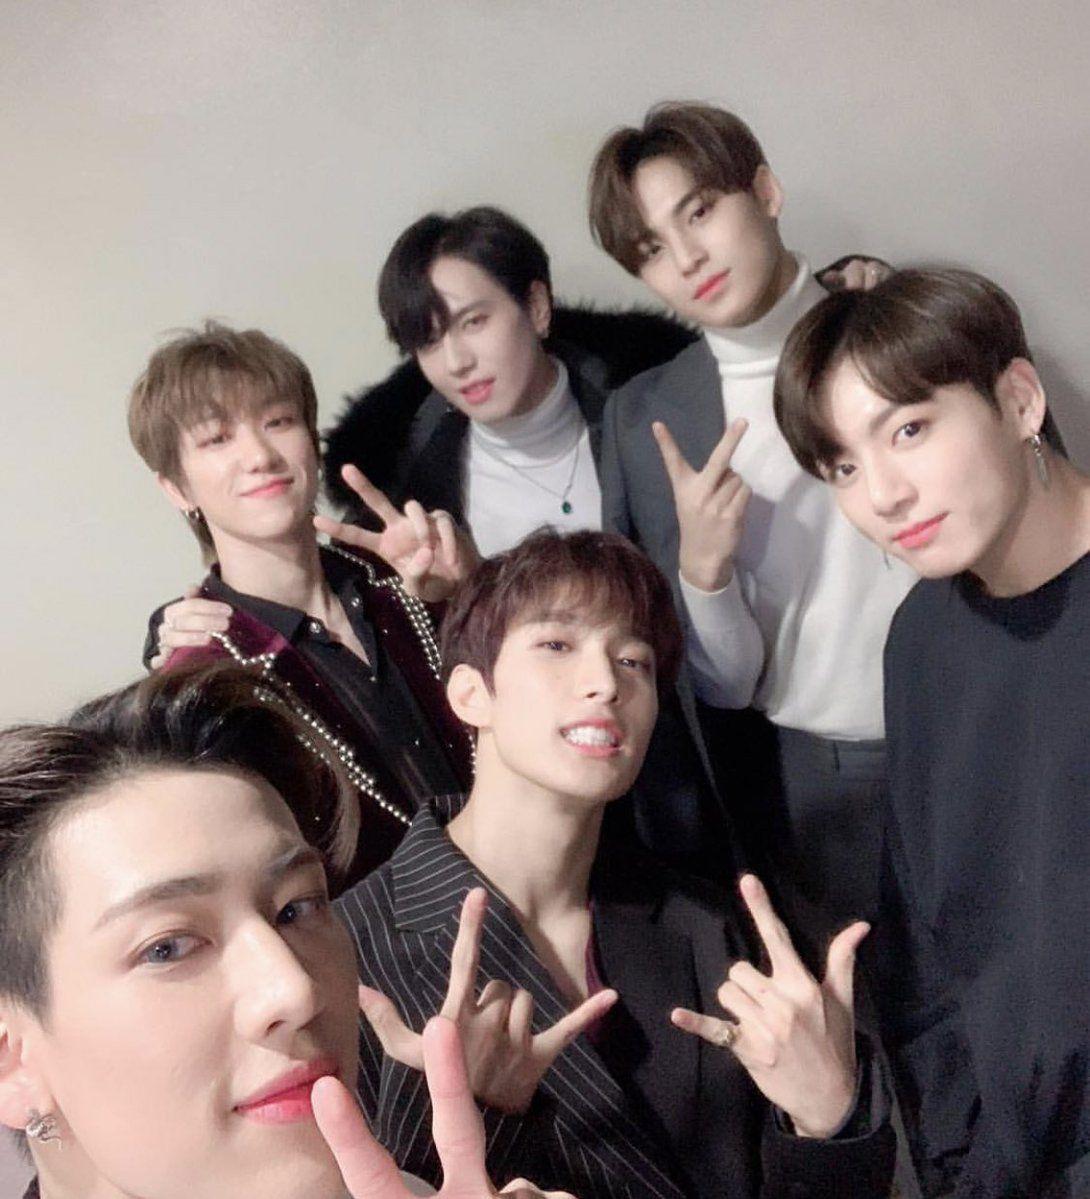 Jungkook With His 97 Line Friends Yugyeom Jungkook Jungkook Mingyu